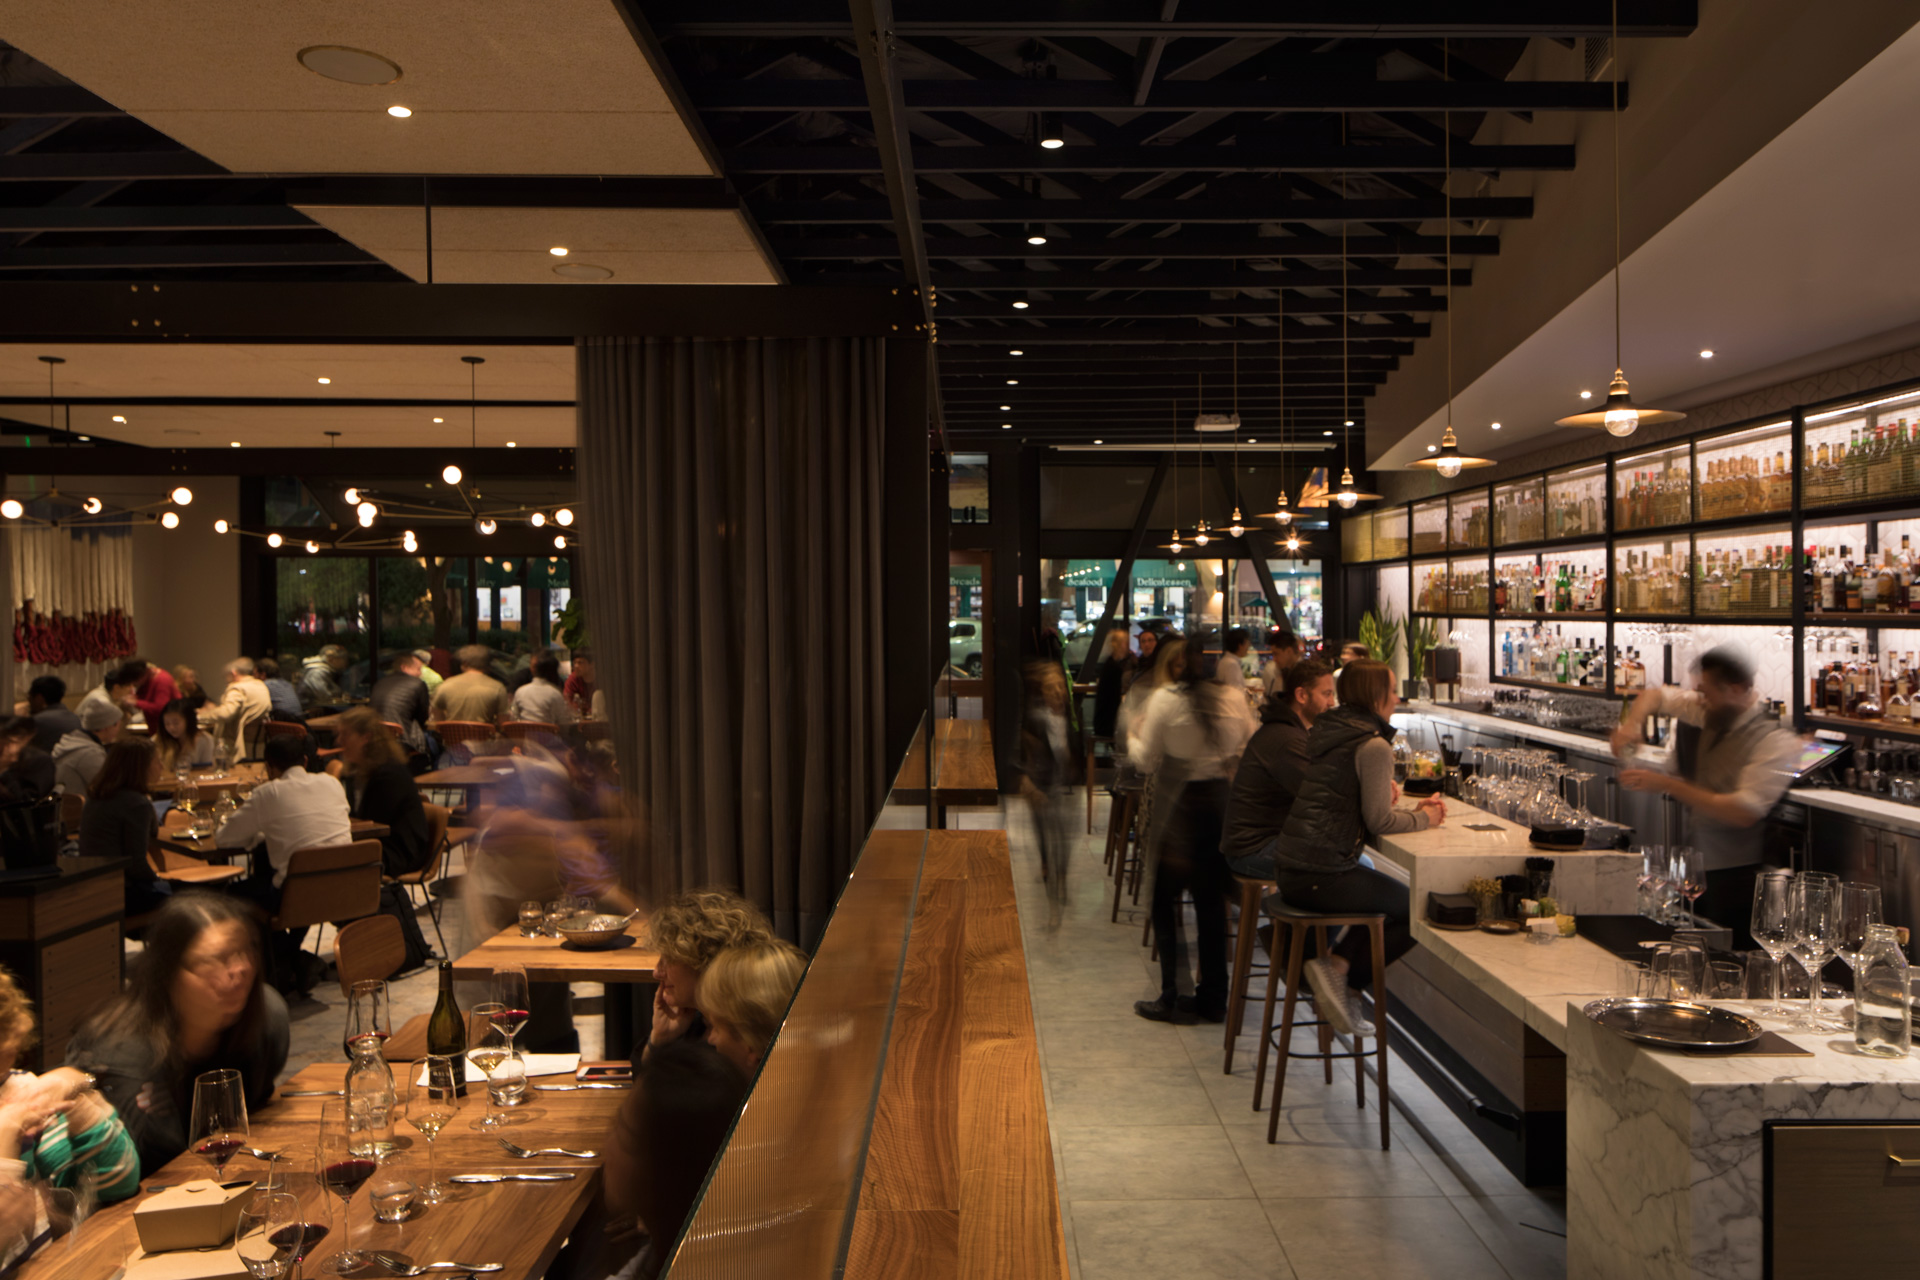 Pausa Bar & Cookery restaurant aristocratic design